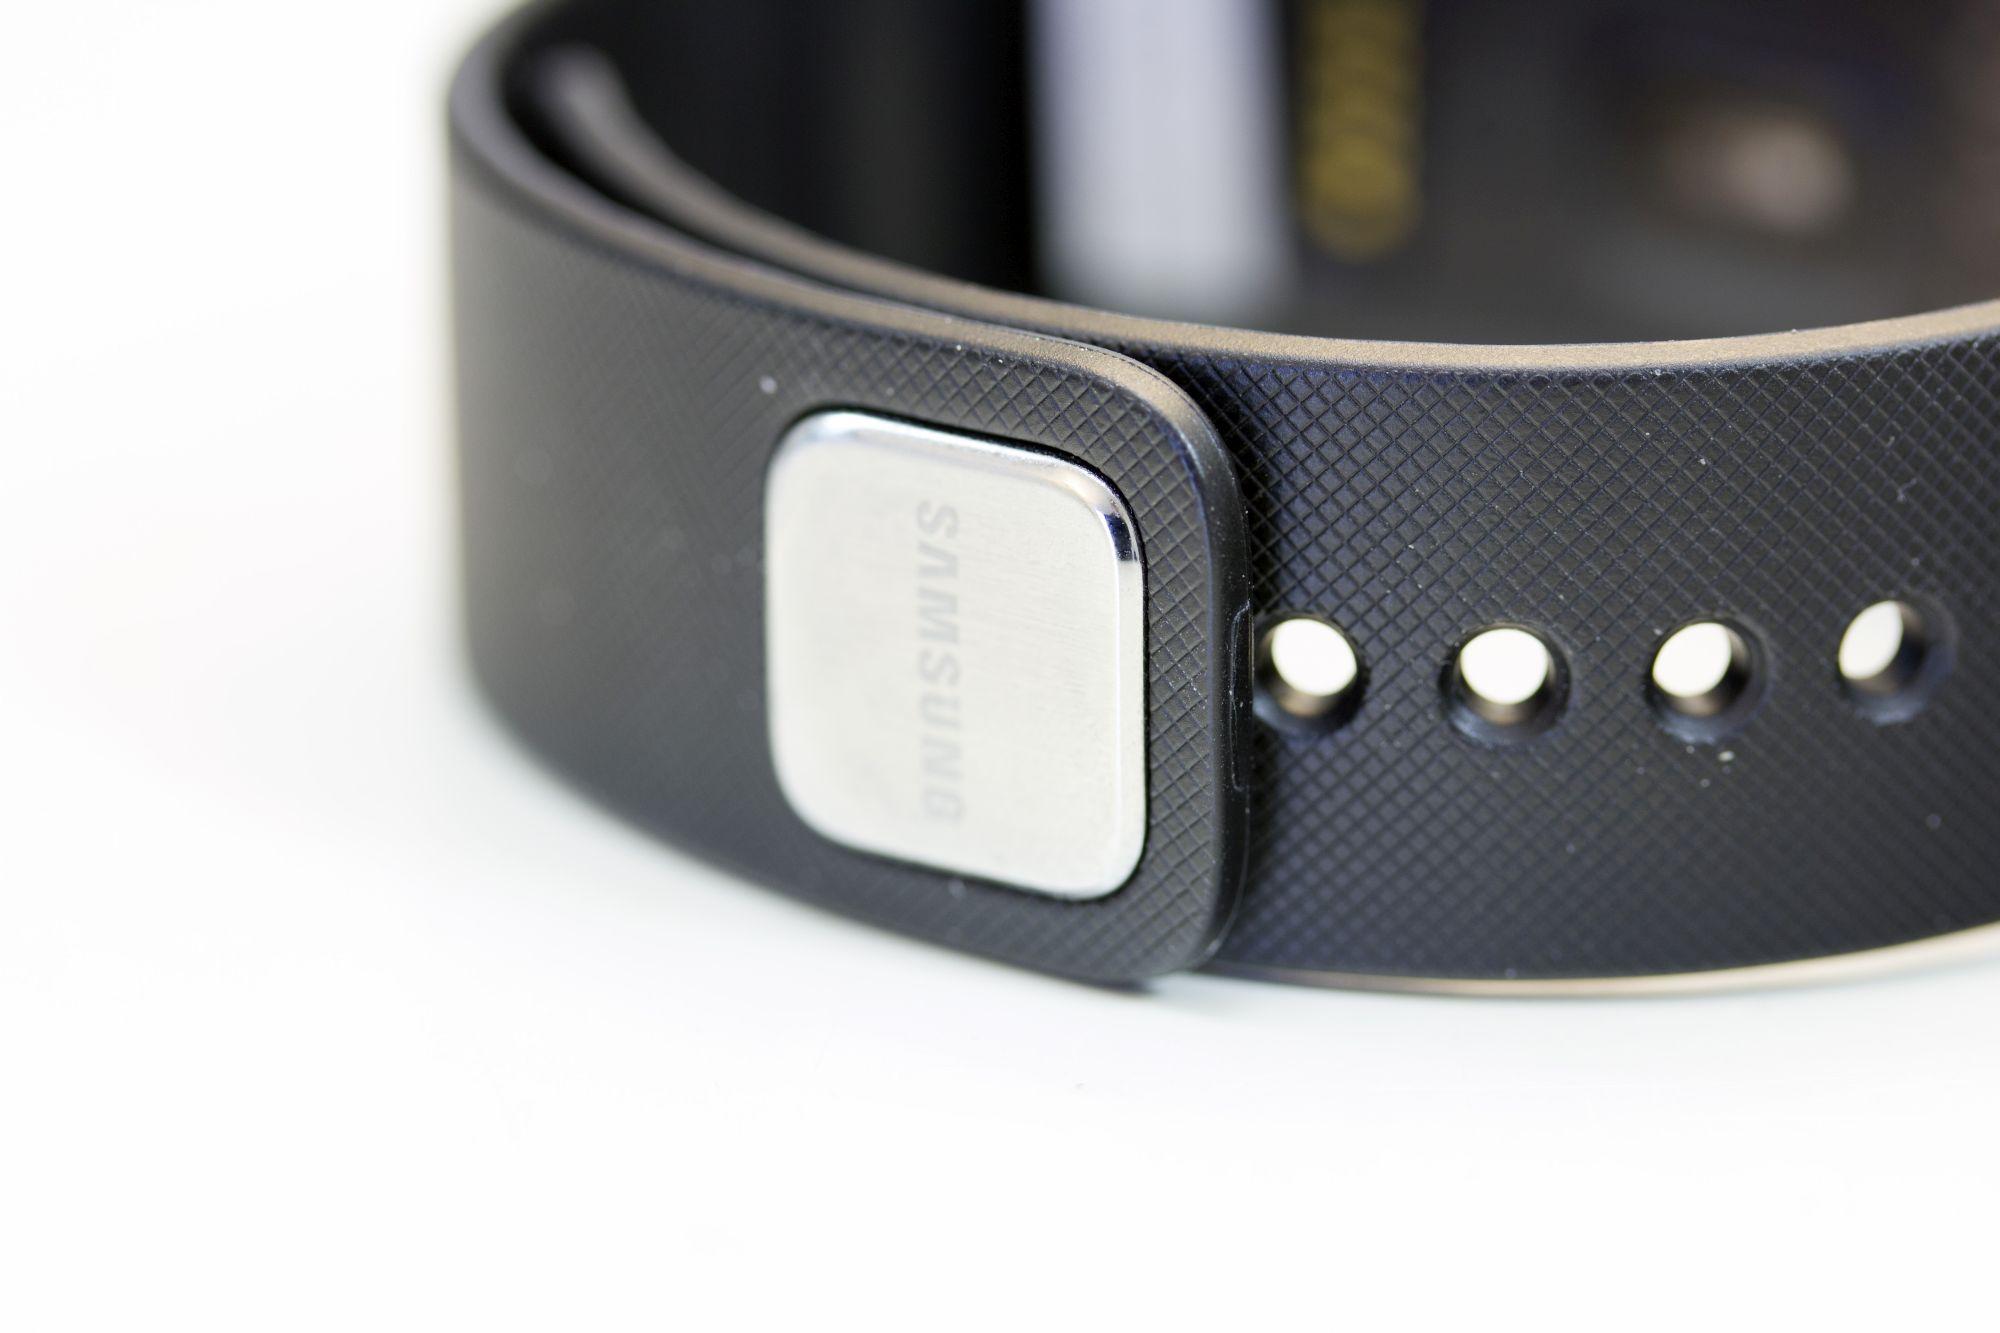 Samsung_Gear_Fit_002